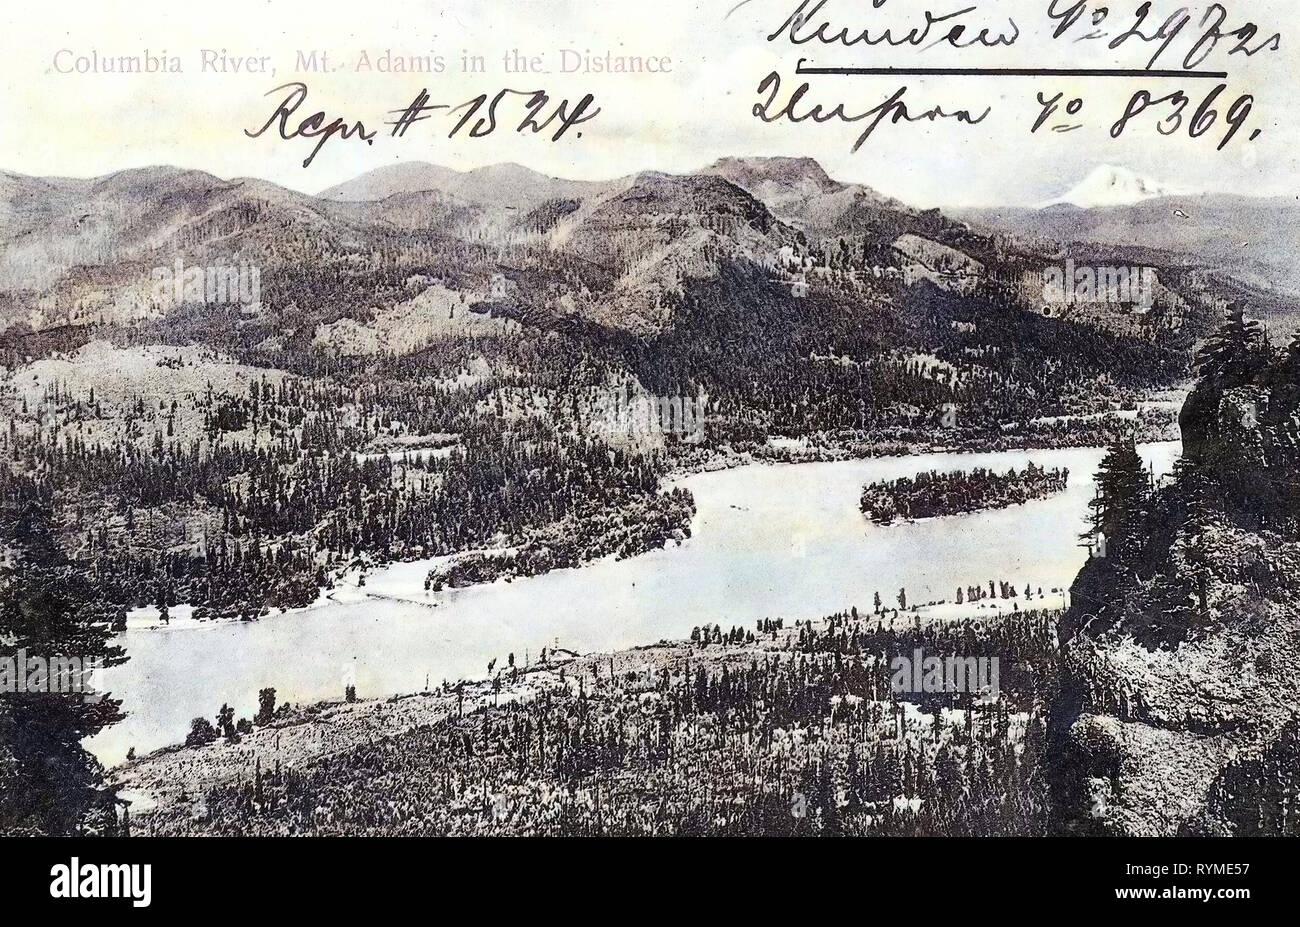 Columbia River Gorge, Mount Adams (Washington), Rocks in